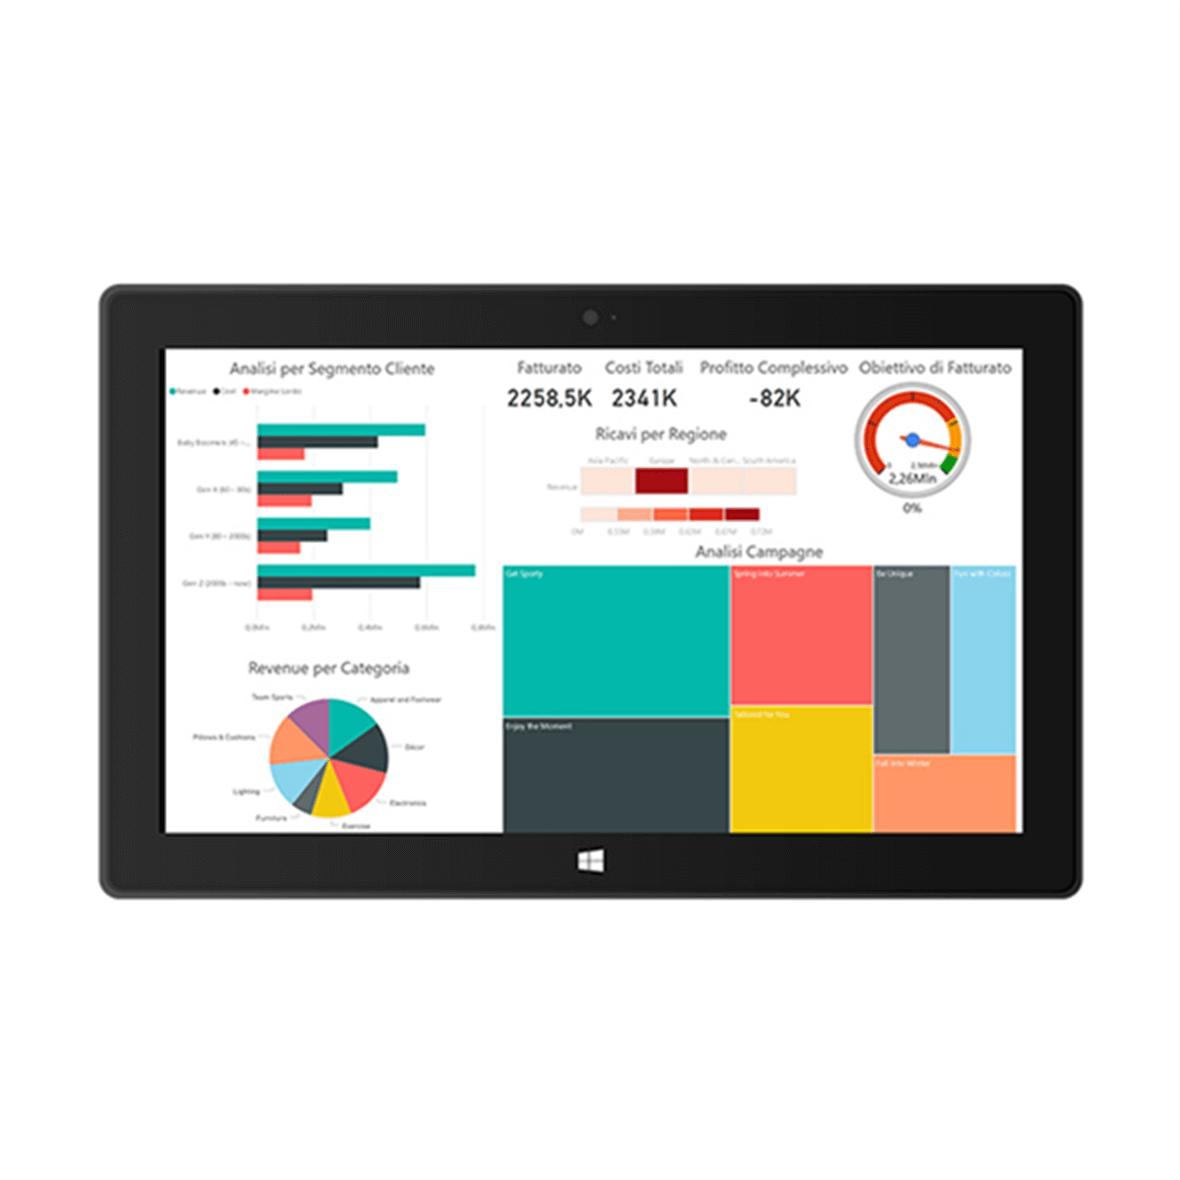 Microsoft Power BI Report